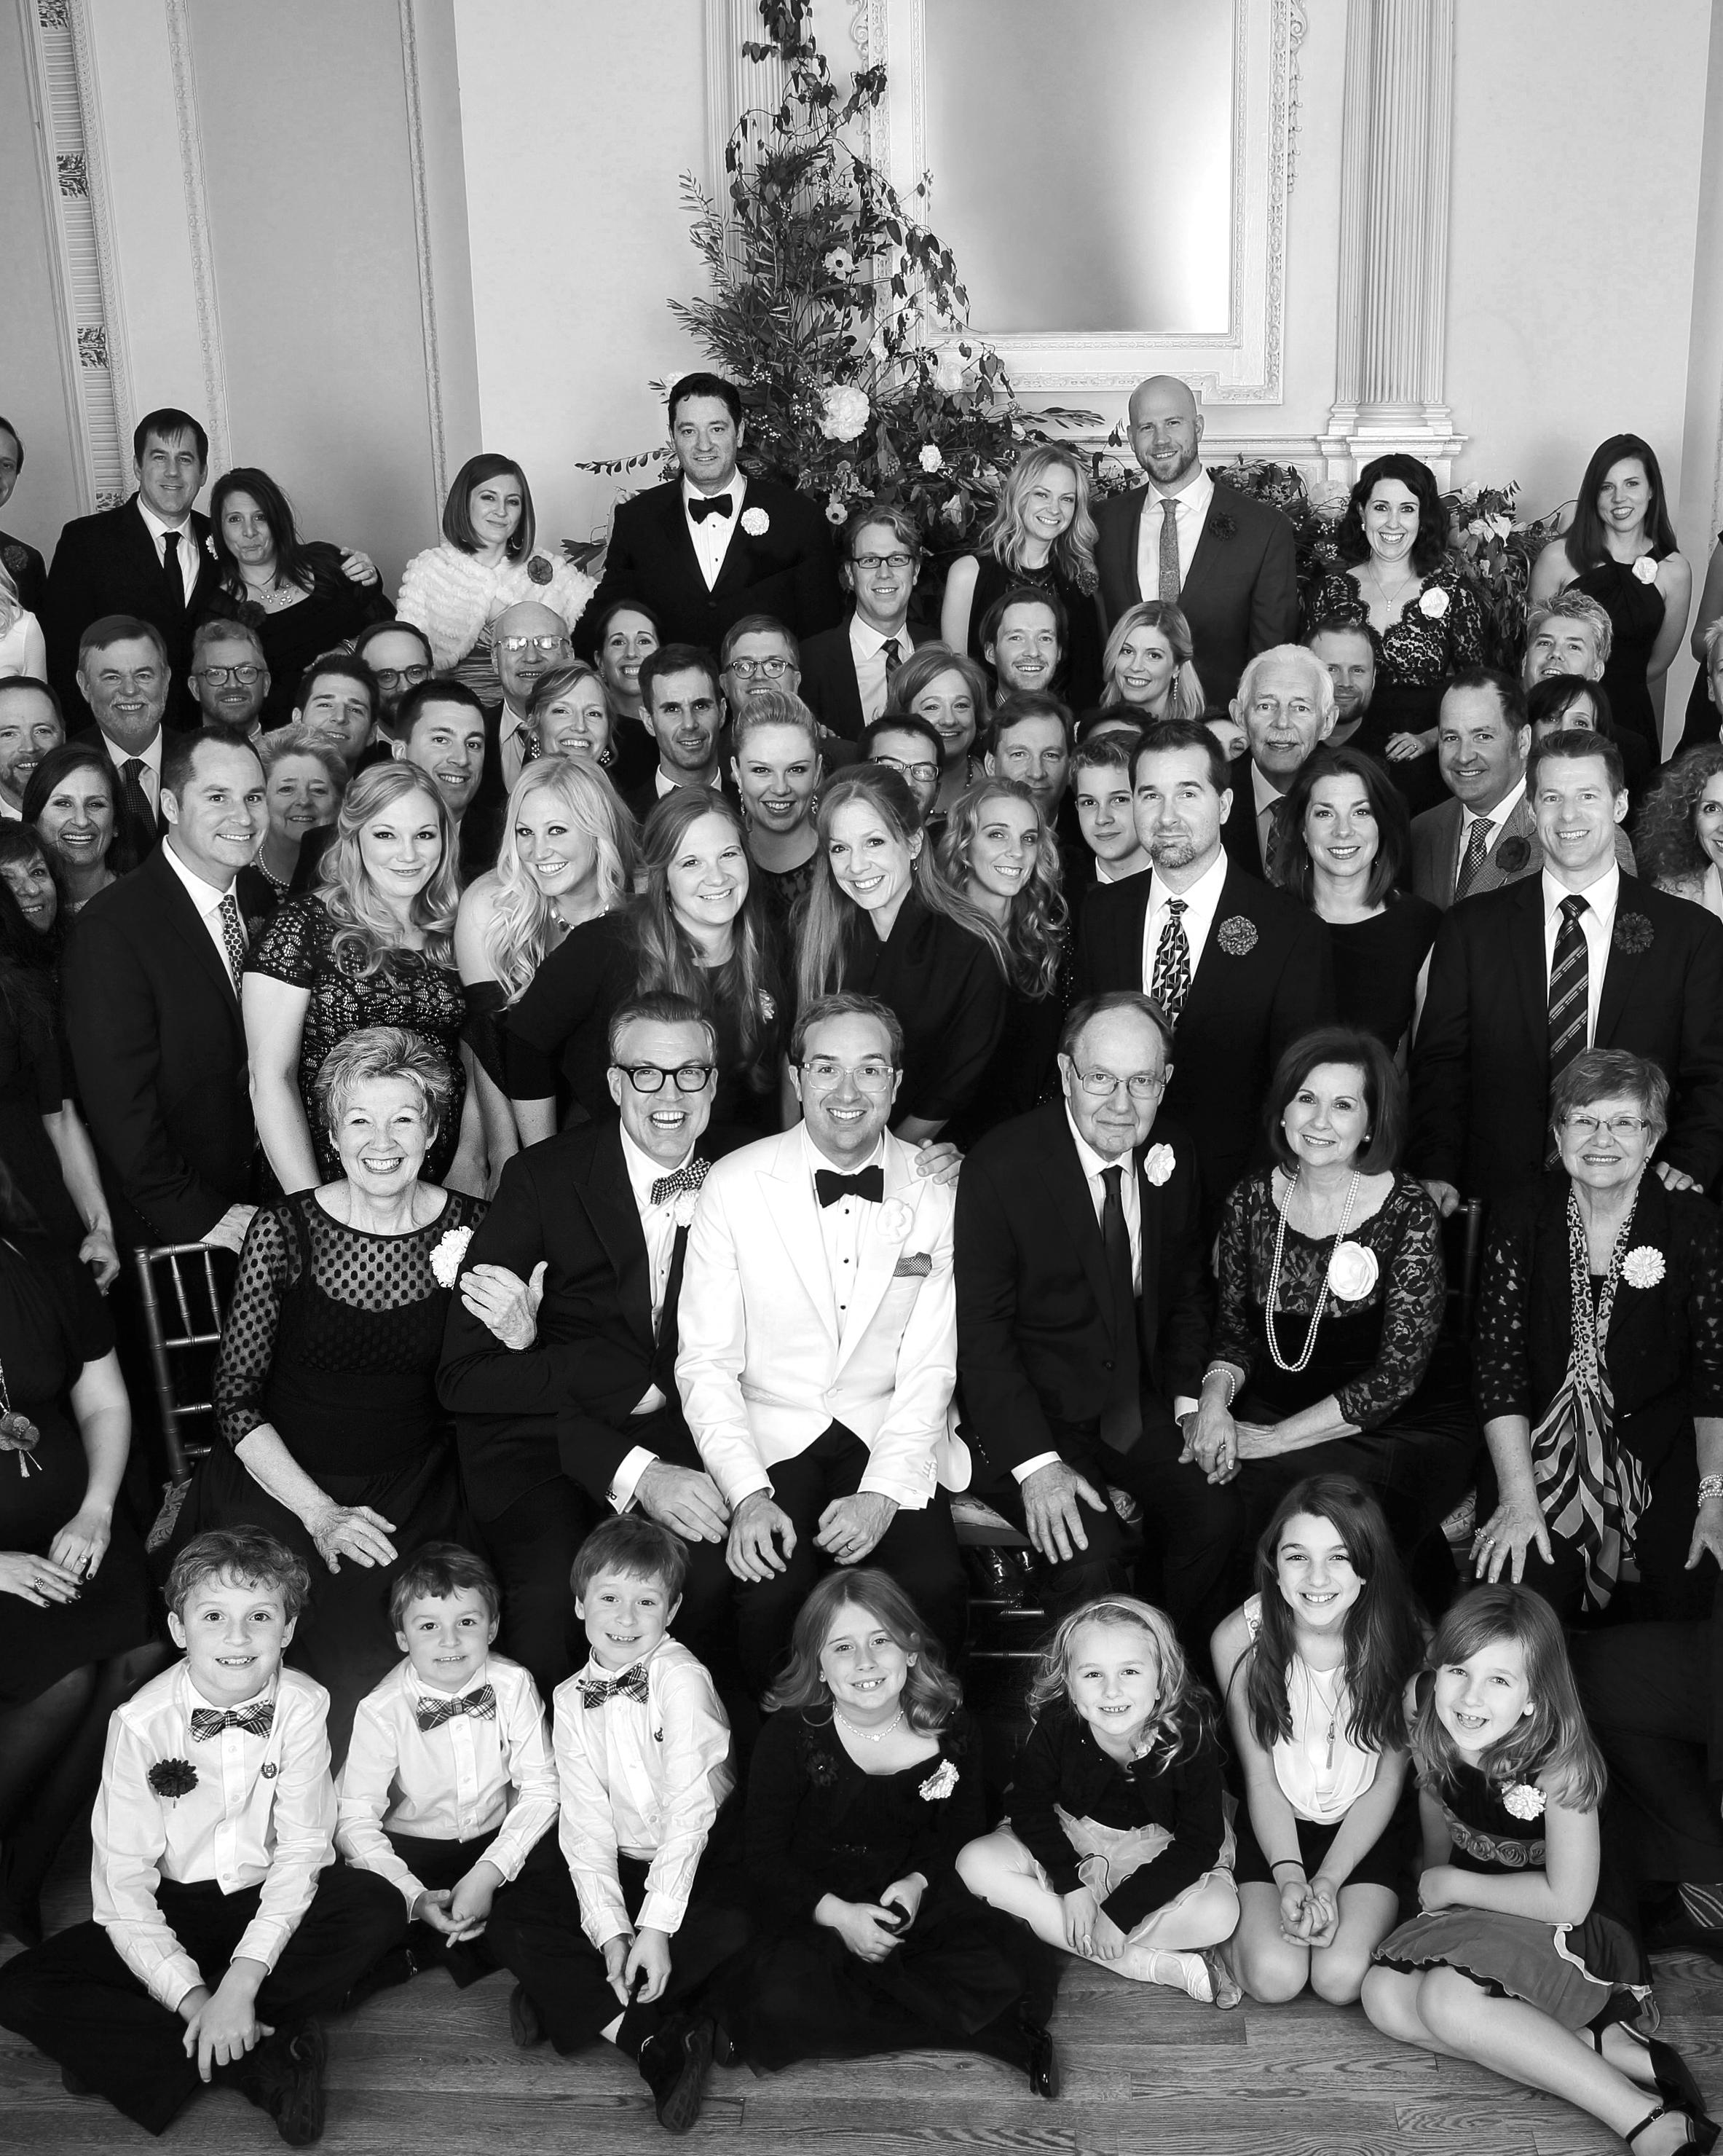 michael-aaron-wedding-141115metmic0079-group-d111619-2.jpg